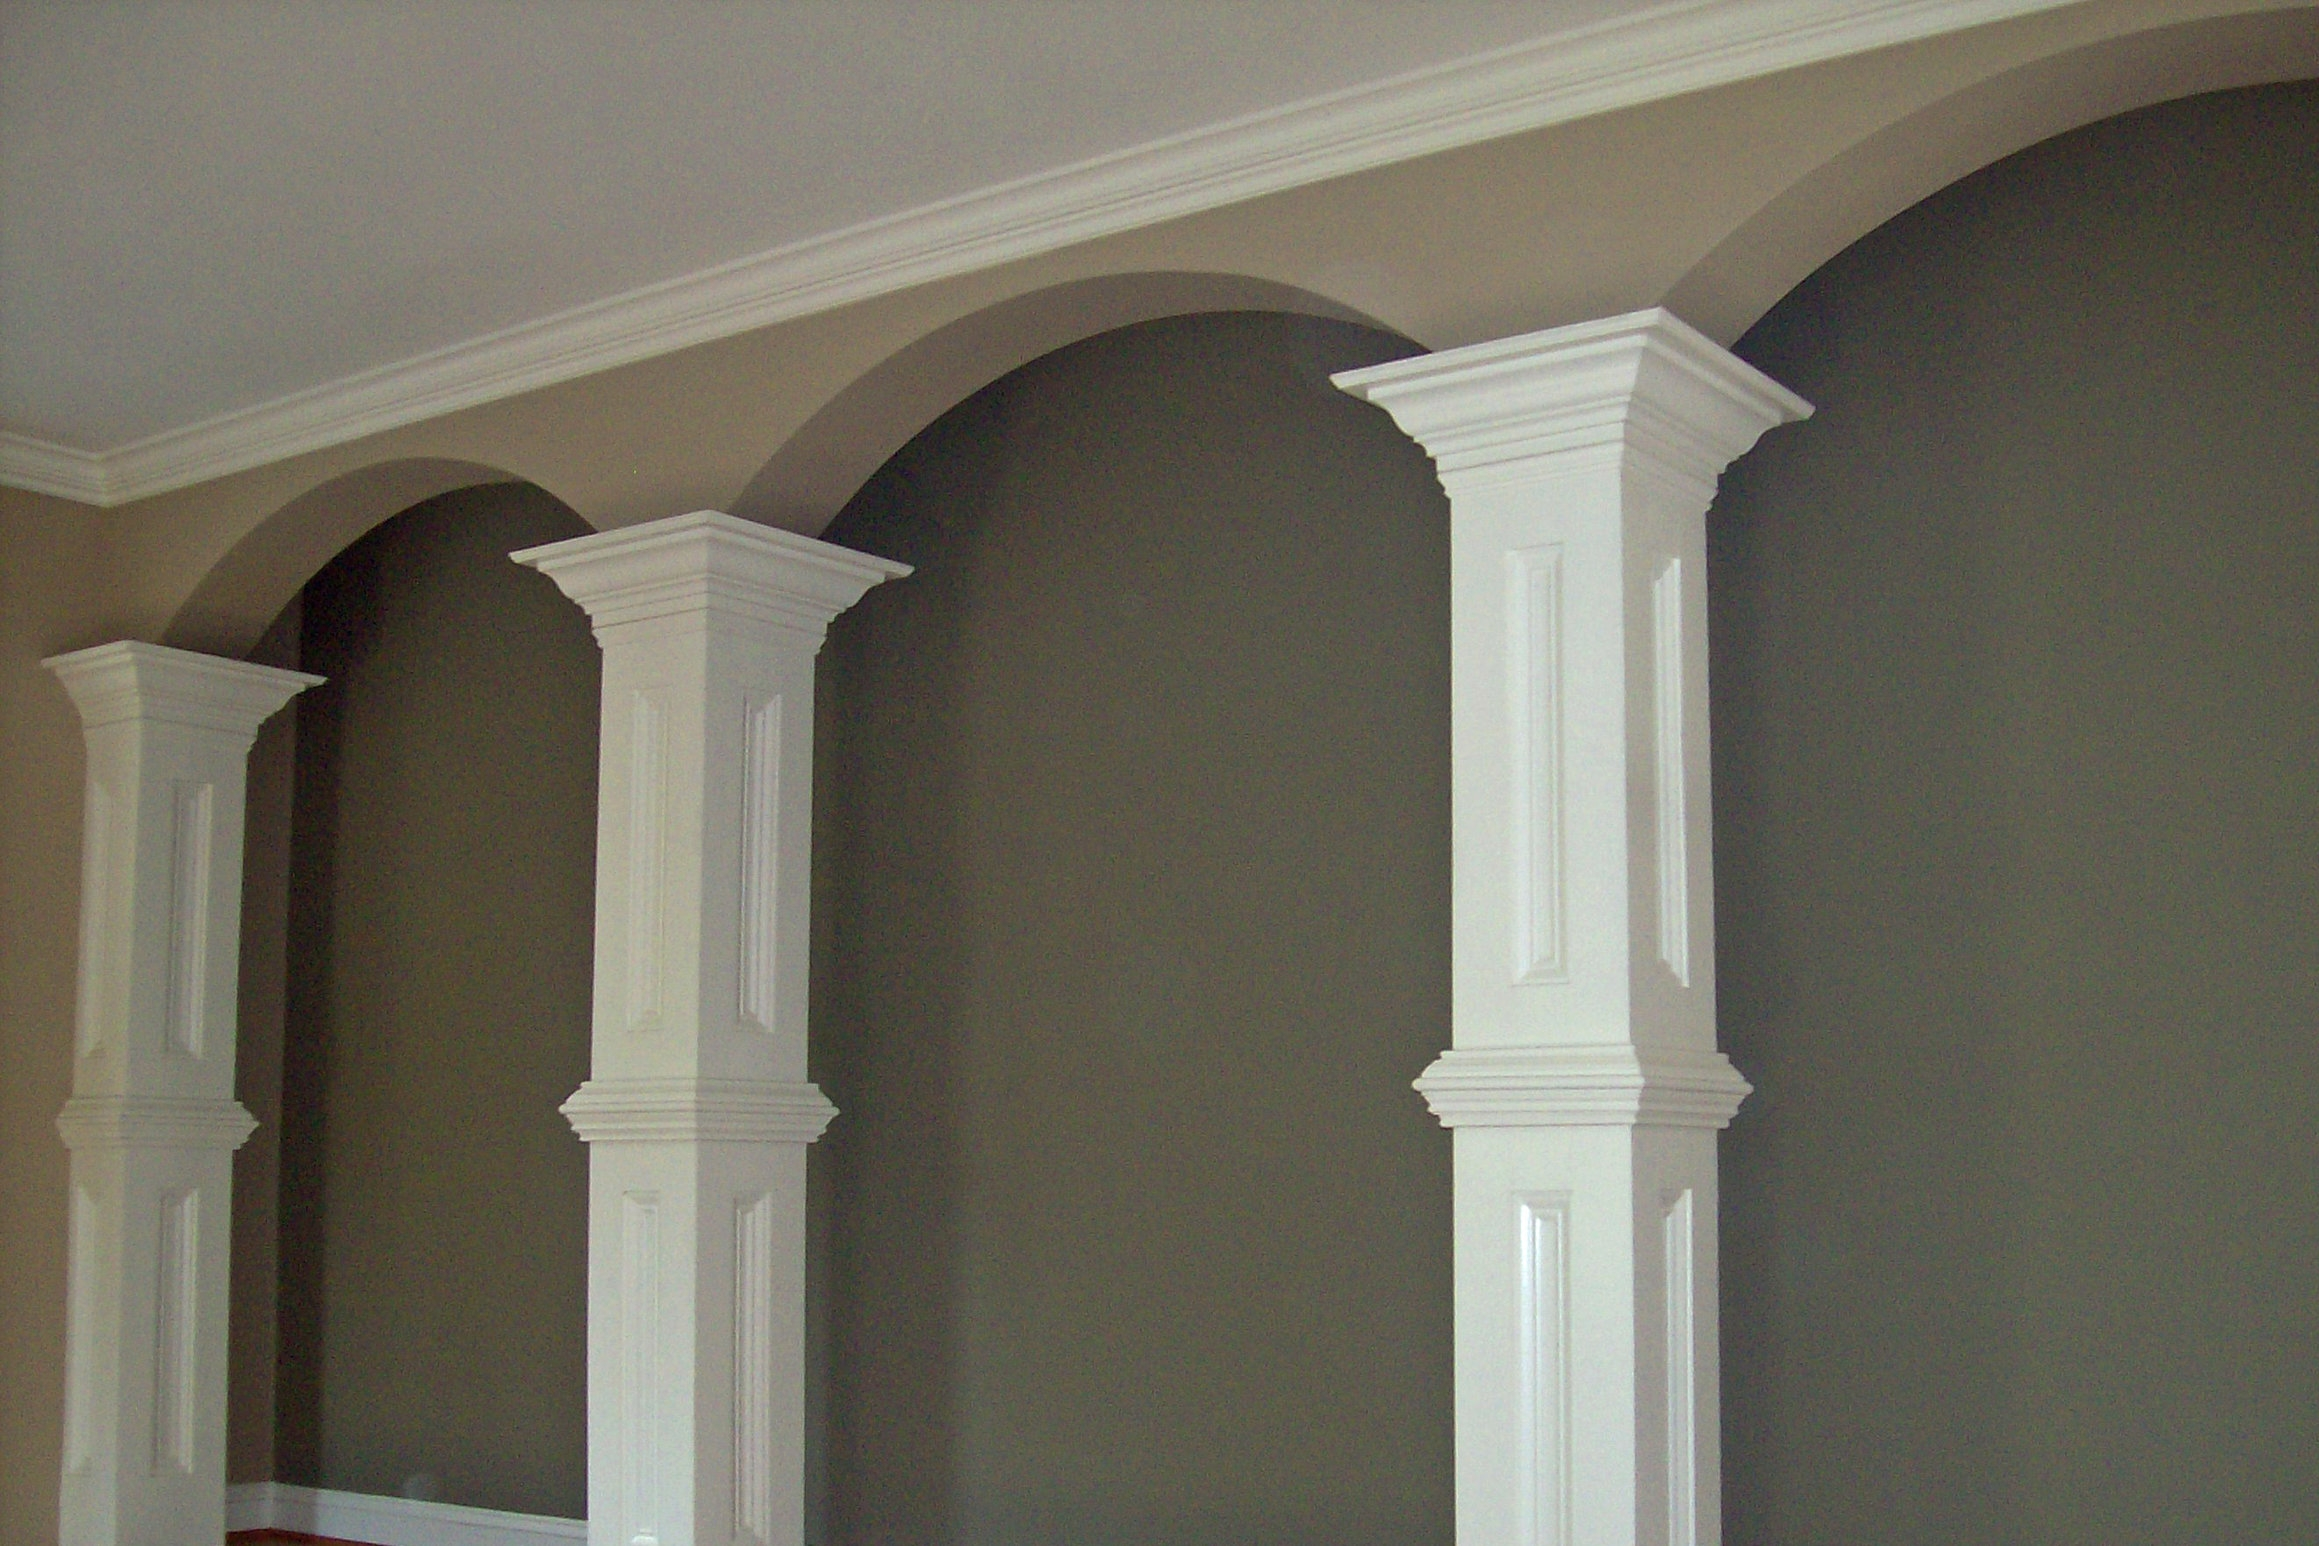 Square Decorative Interior Columns